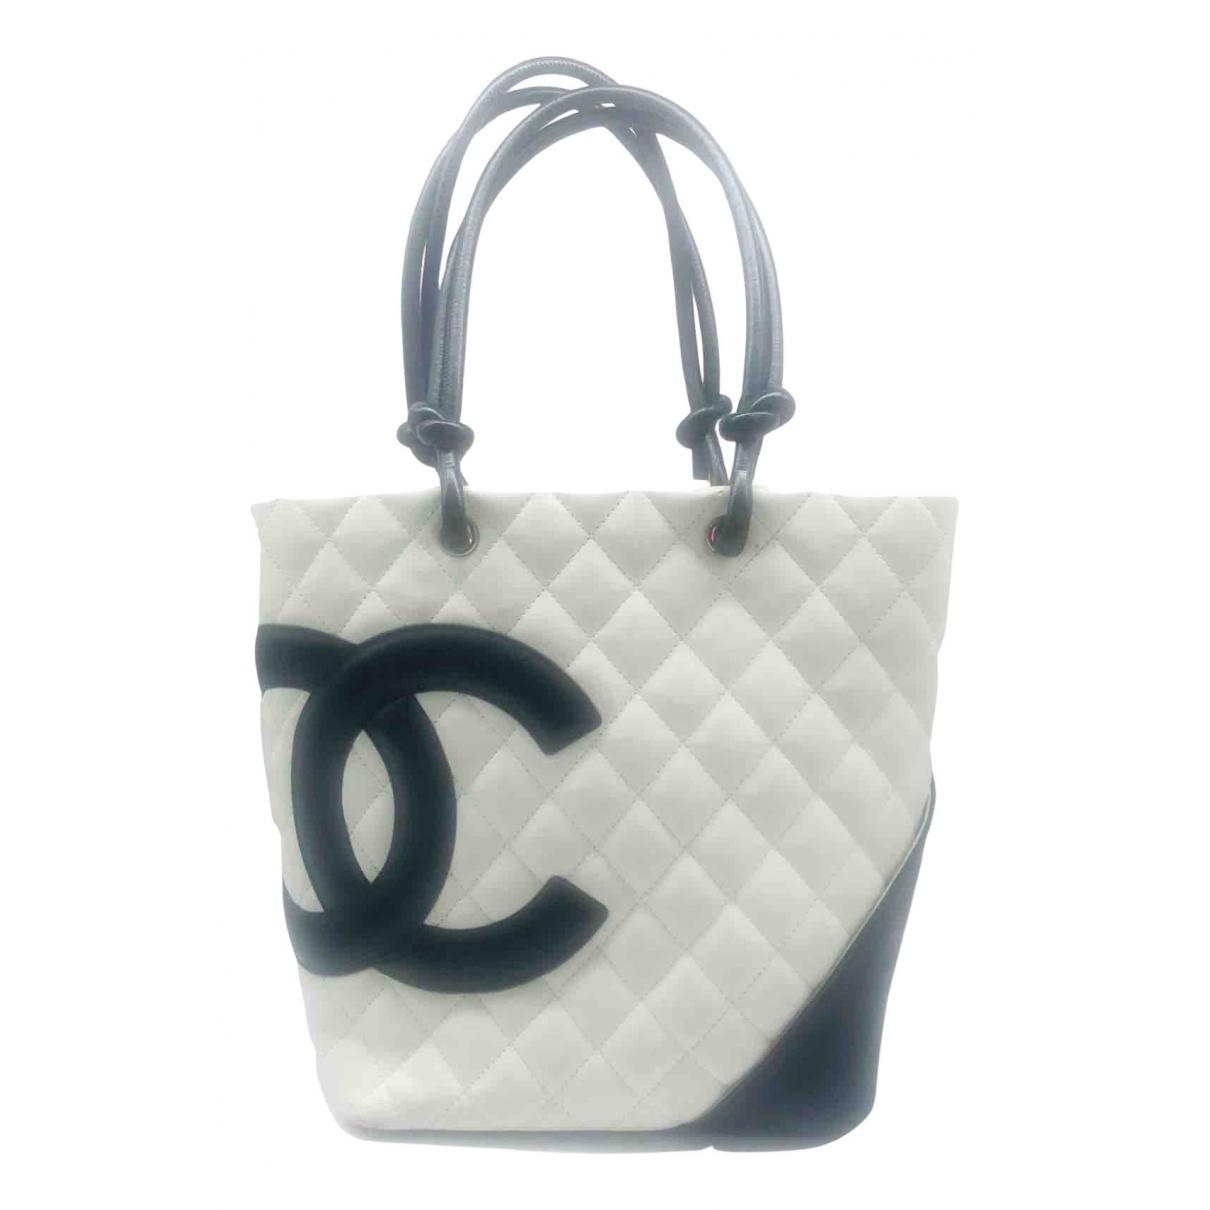 Bolso  Cambon de Cuero Chanel